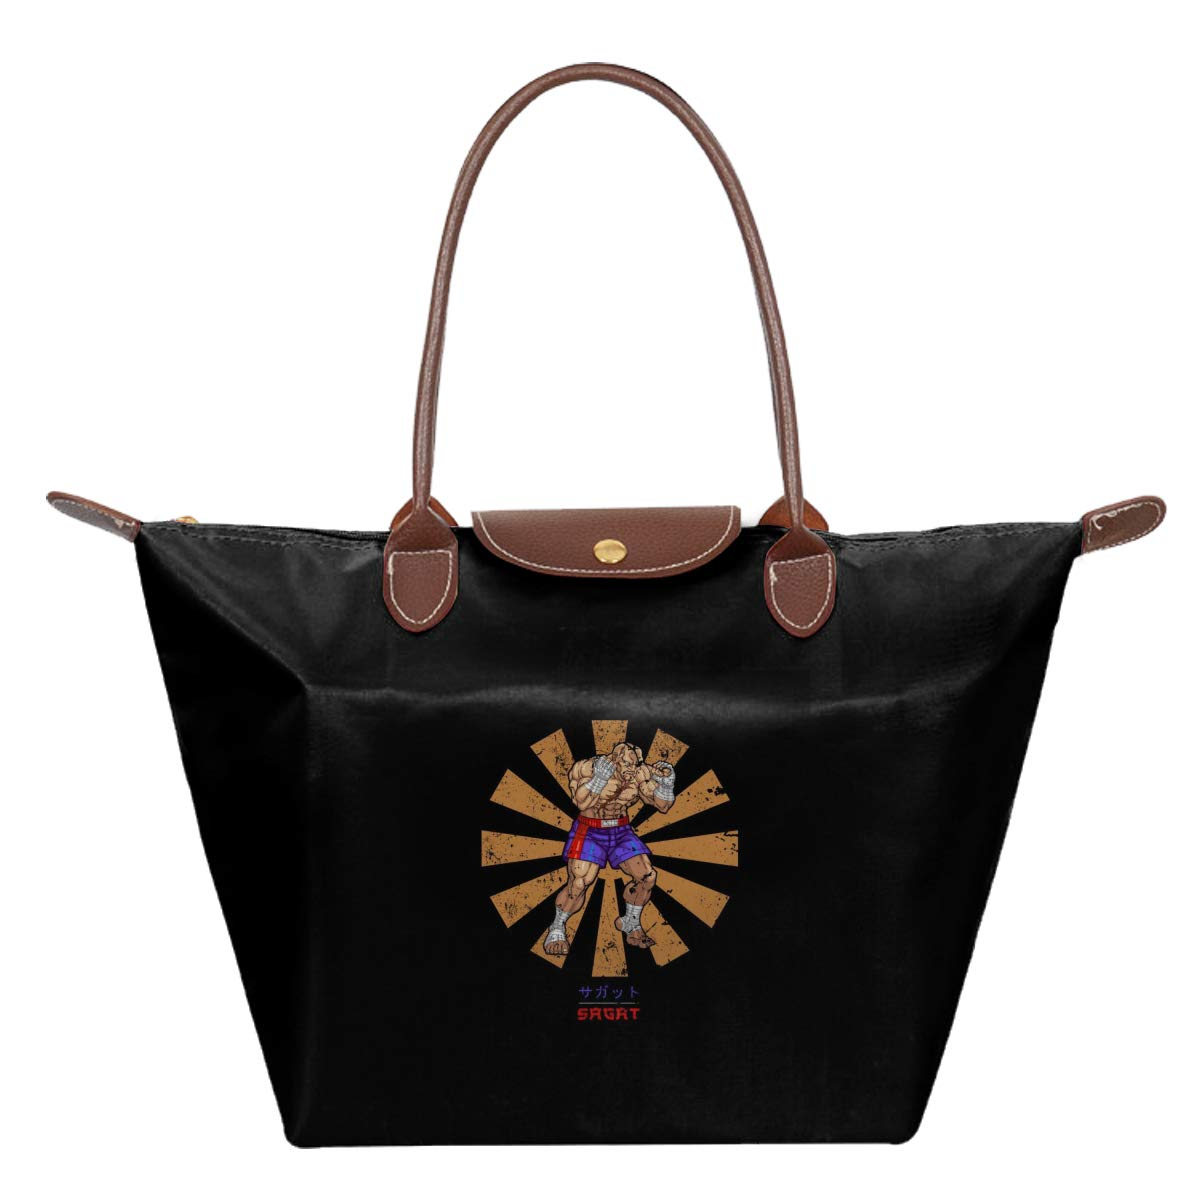 Street Fighter Sagat Retro Japanese Waterproof Leather Folded Messenger Nylon Bag Travel Tote Hopping Folding School Handbags